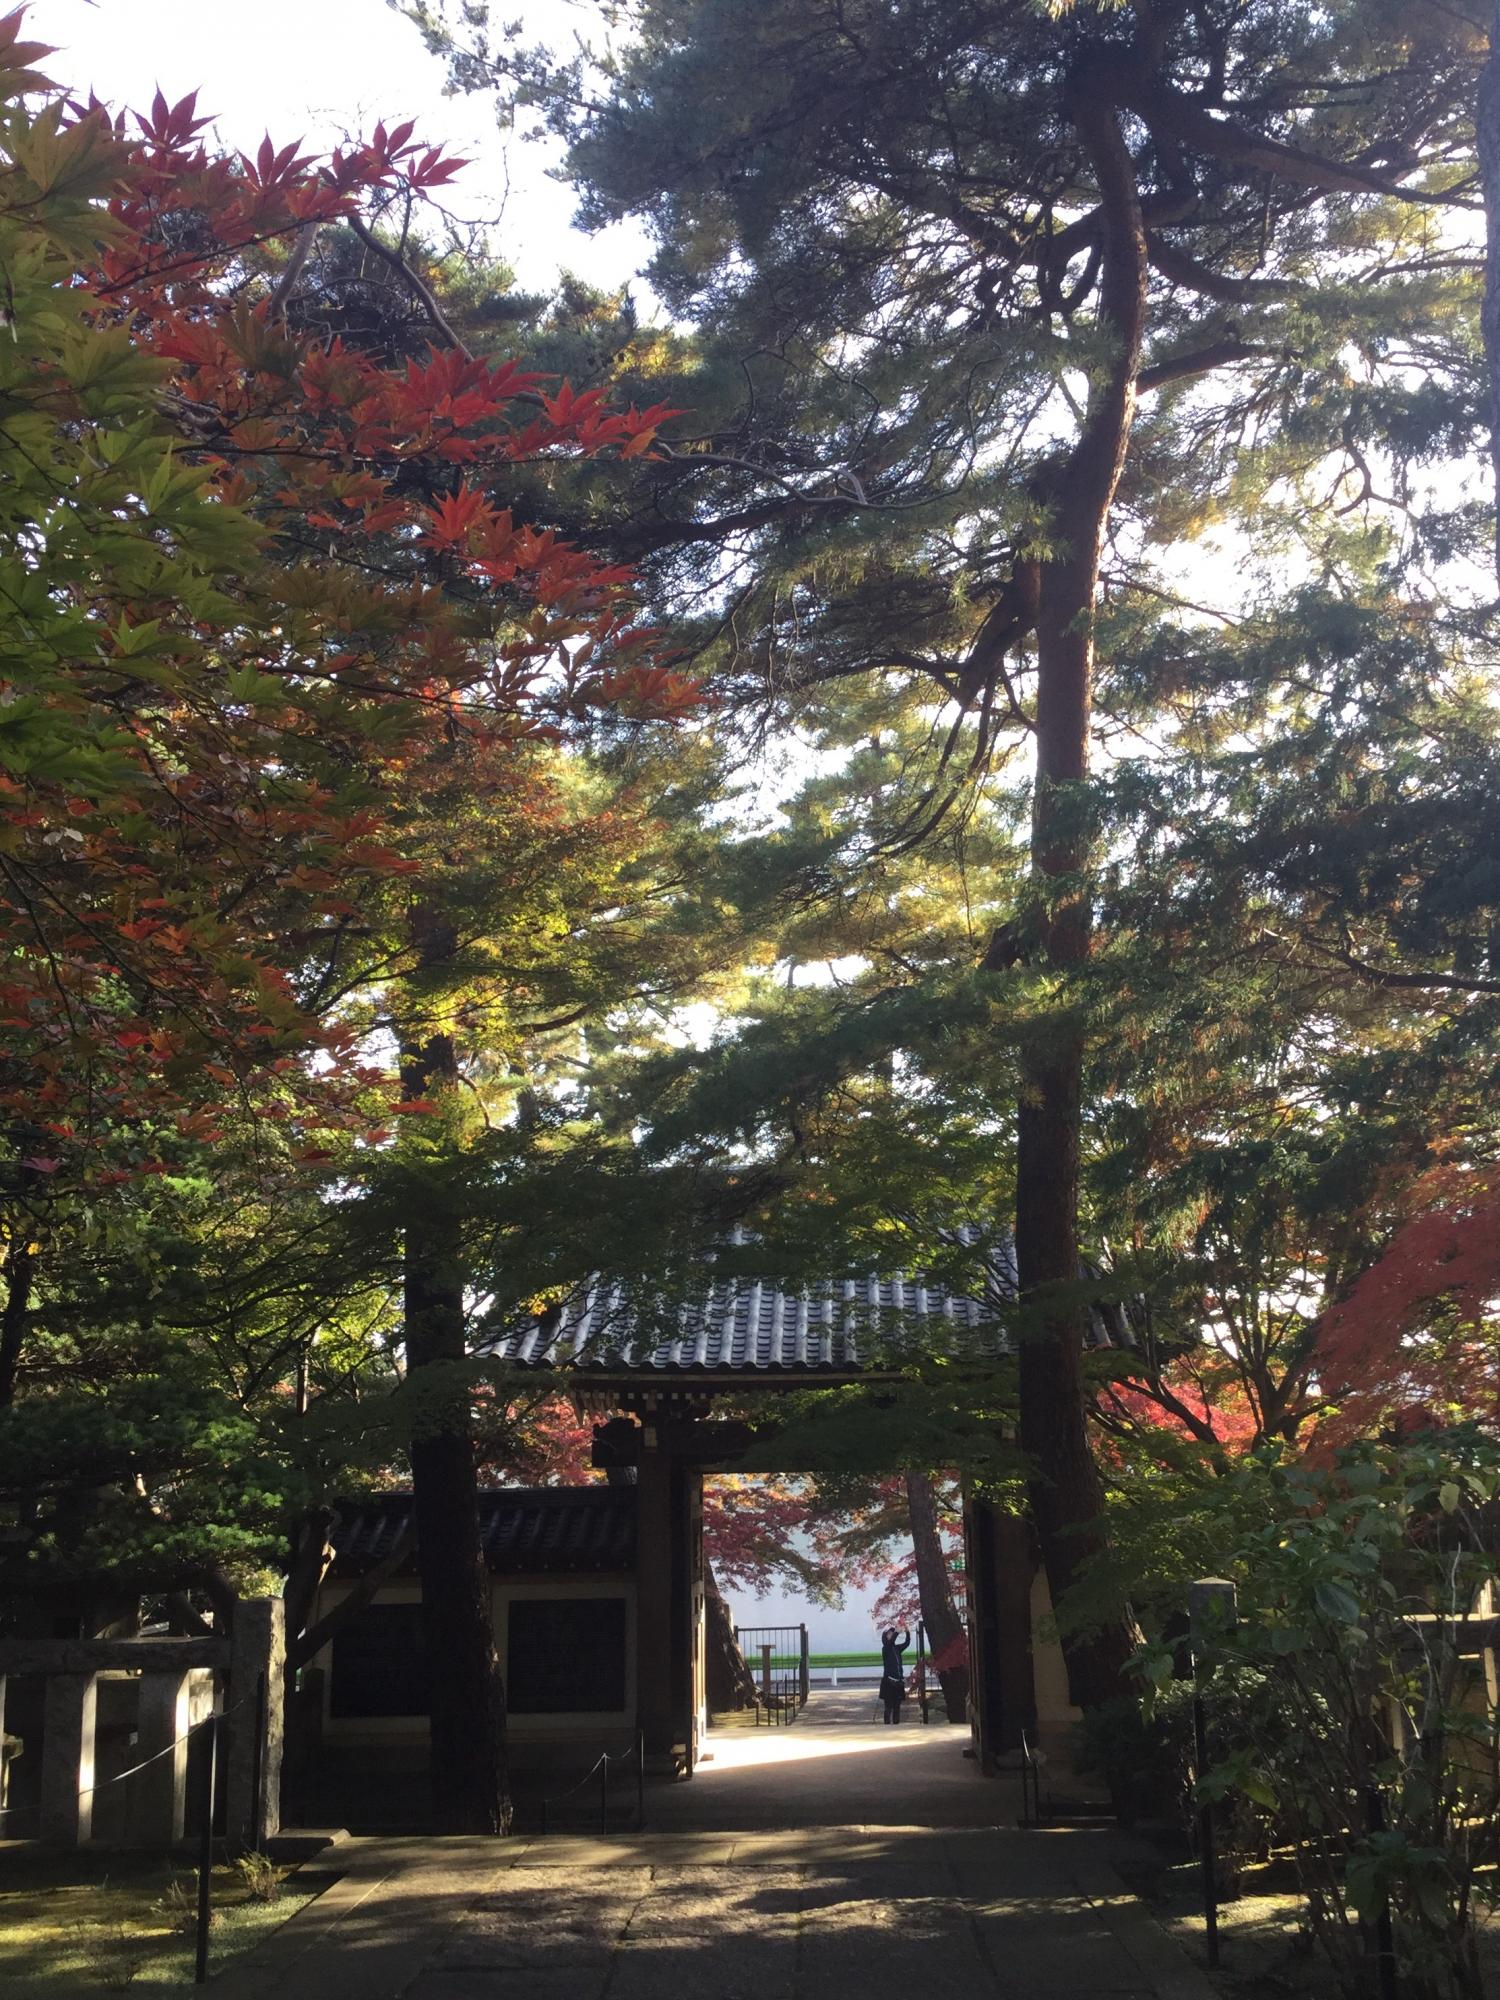 Autumn colors are beautiful! Image